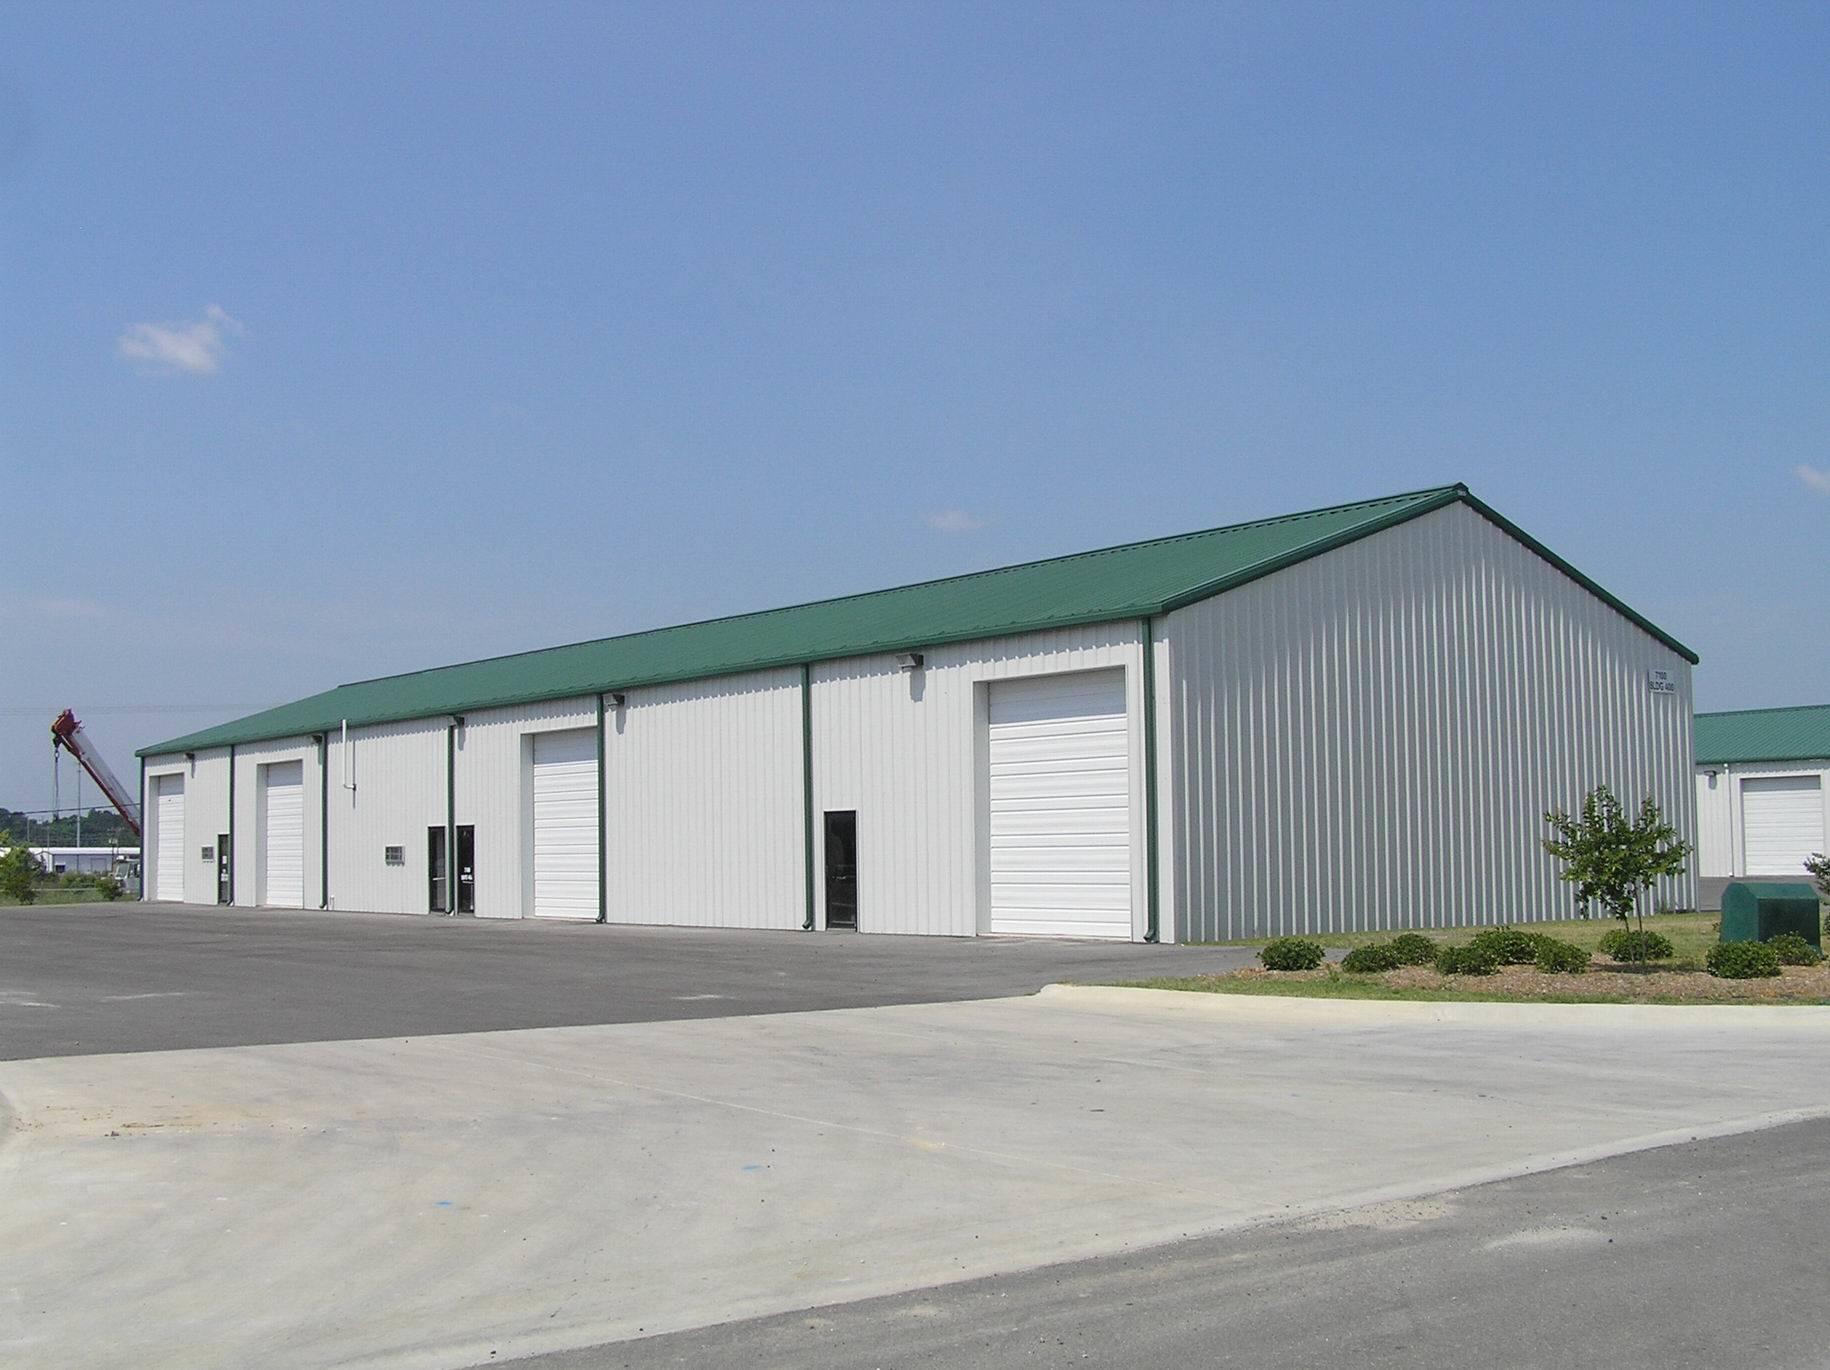 Portes de garage en aluminium prix - Aliexpress